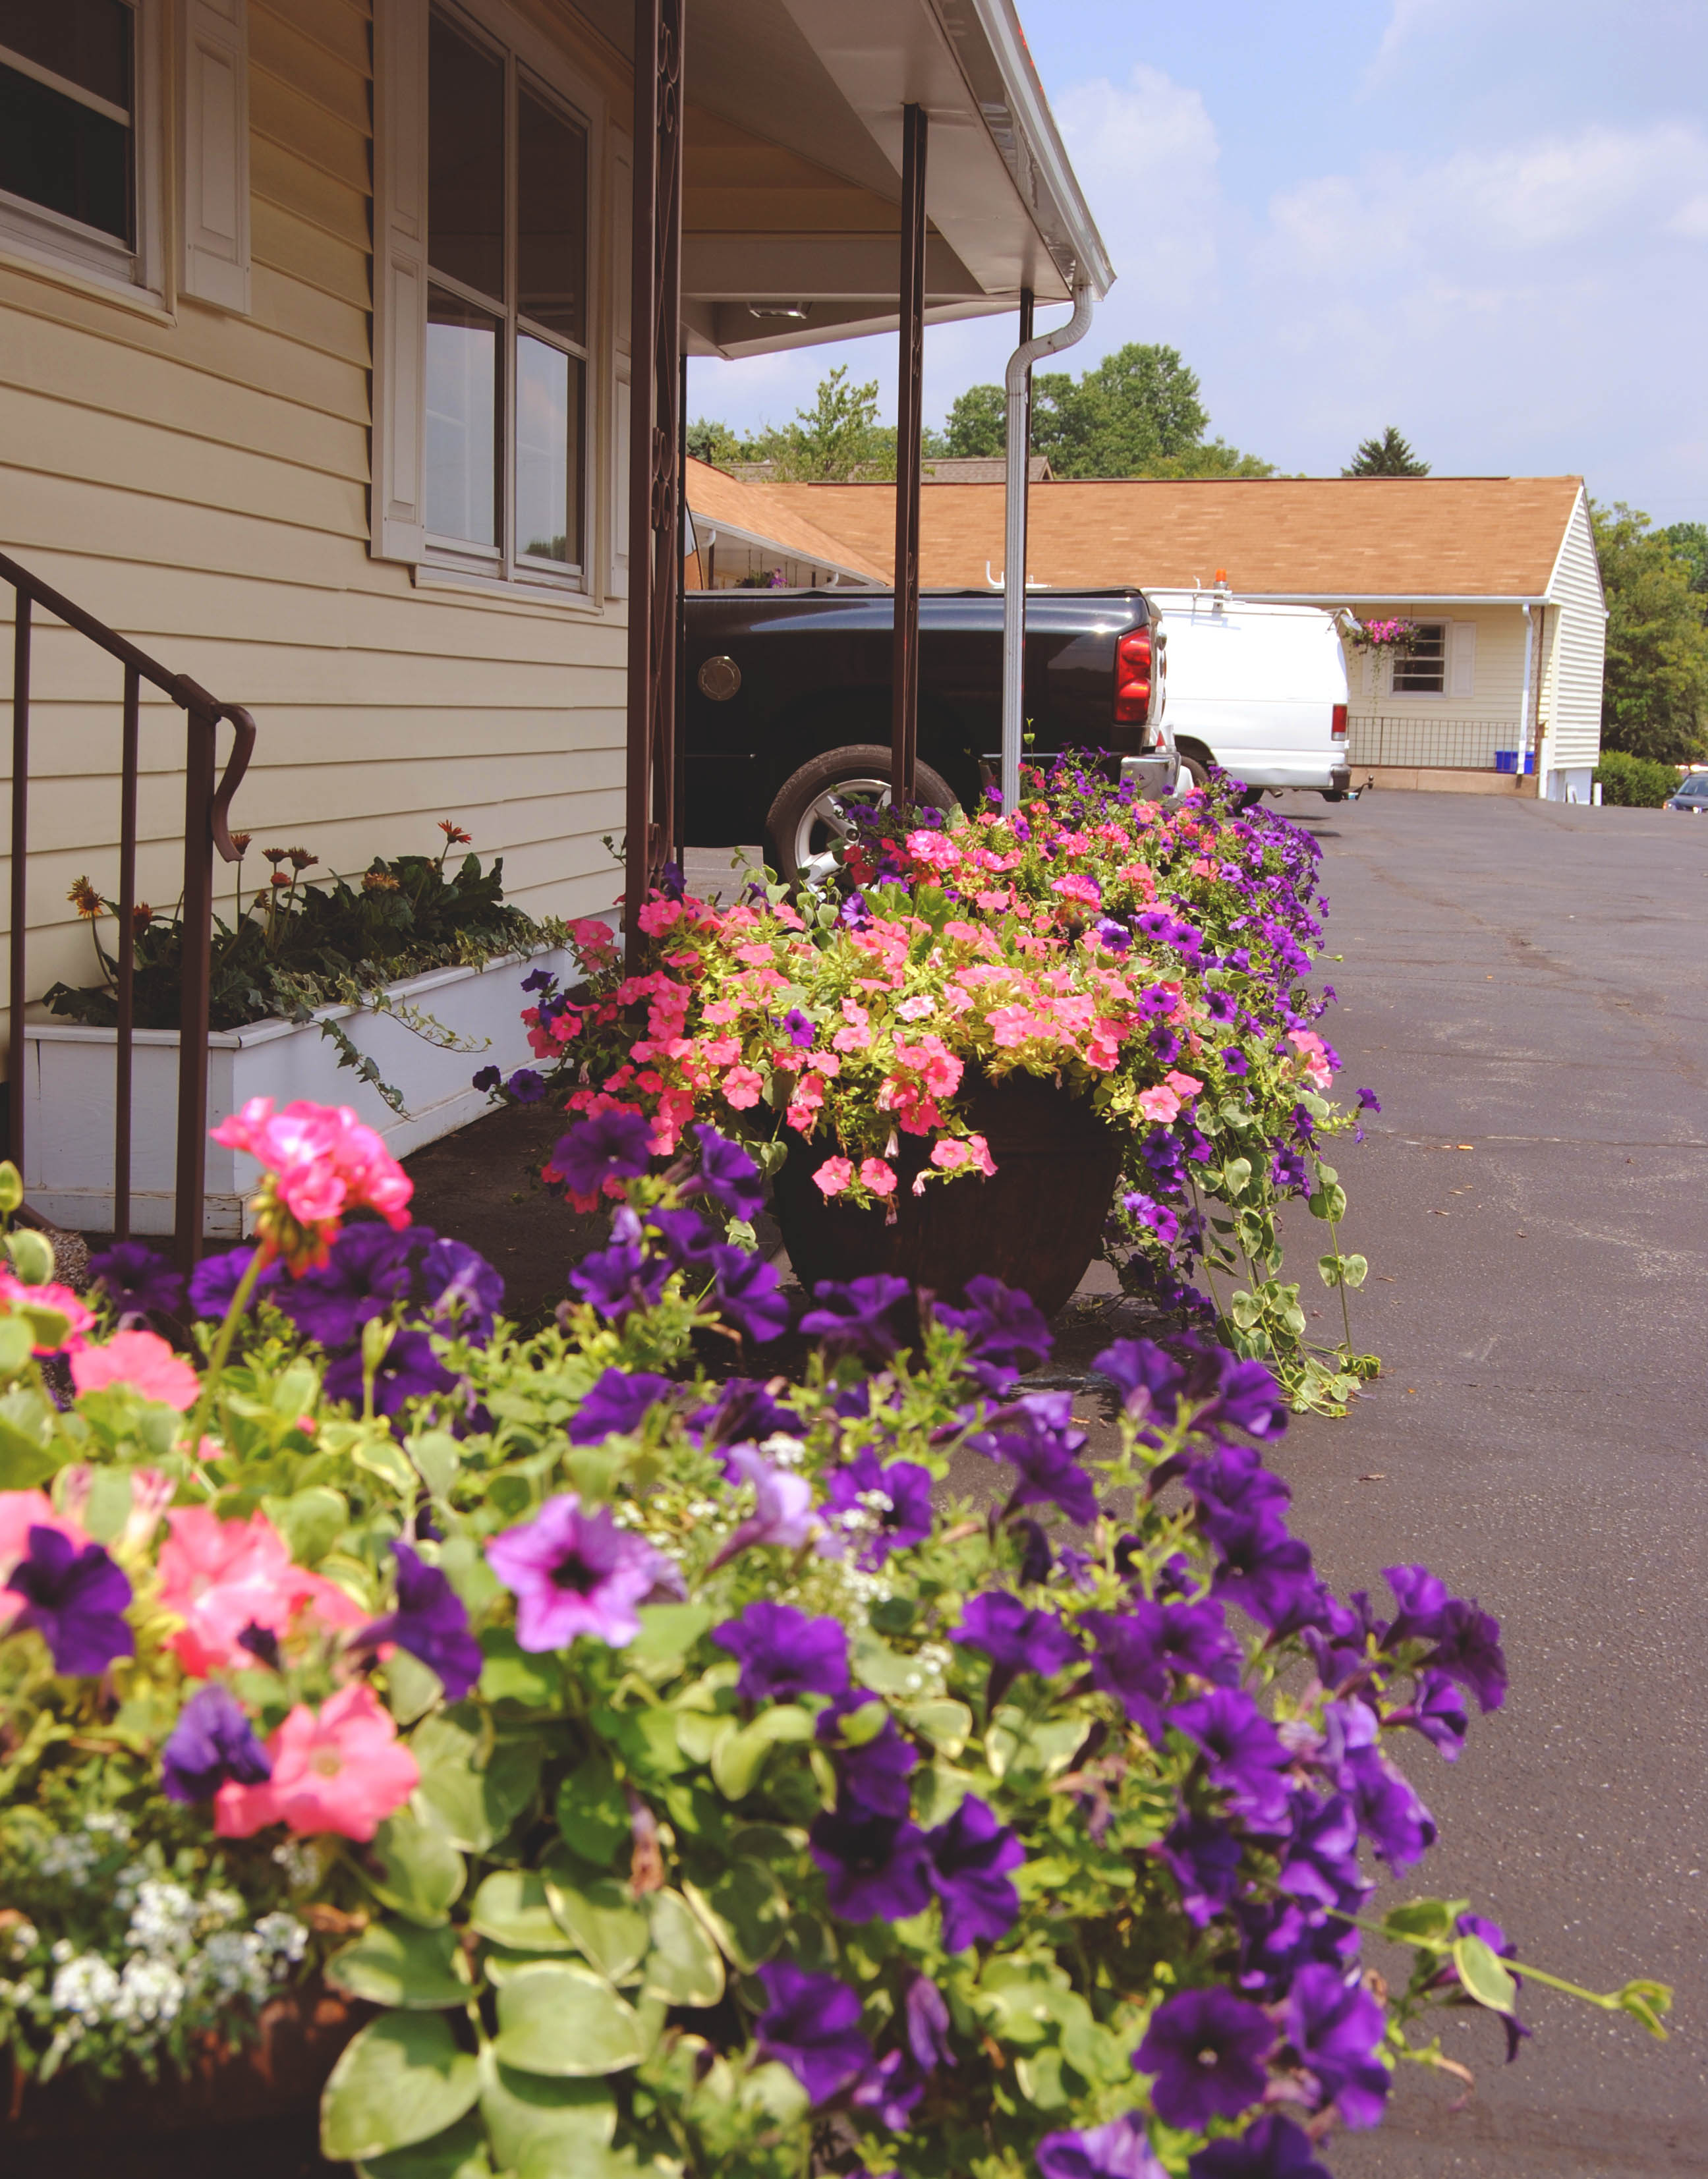 flower beds outside of the stevens motel - rates